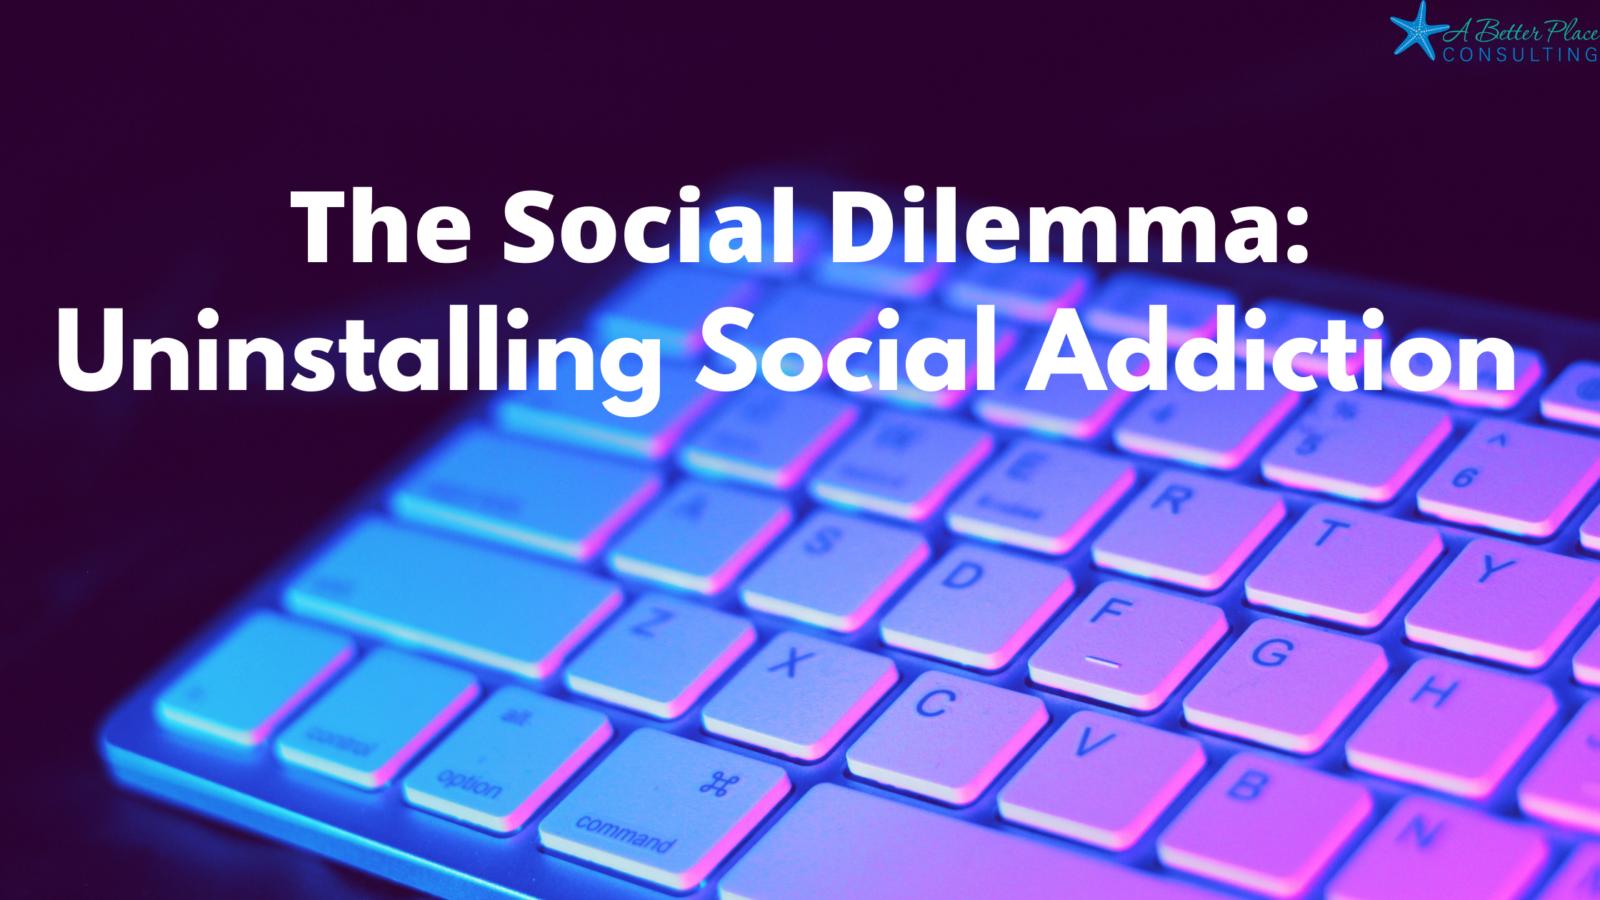 The-Social-Dilemma_-Uninstalling-Social-Addiction